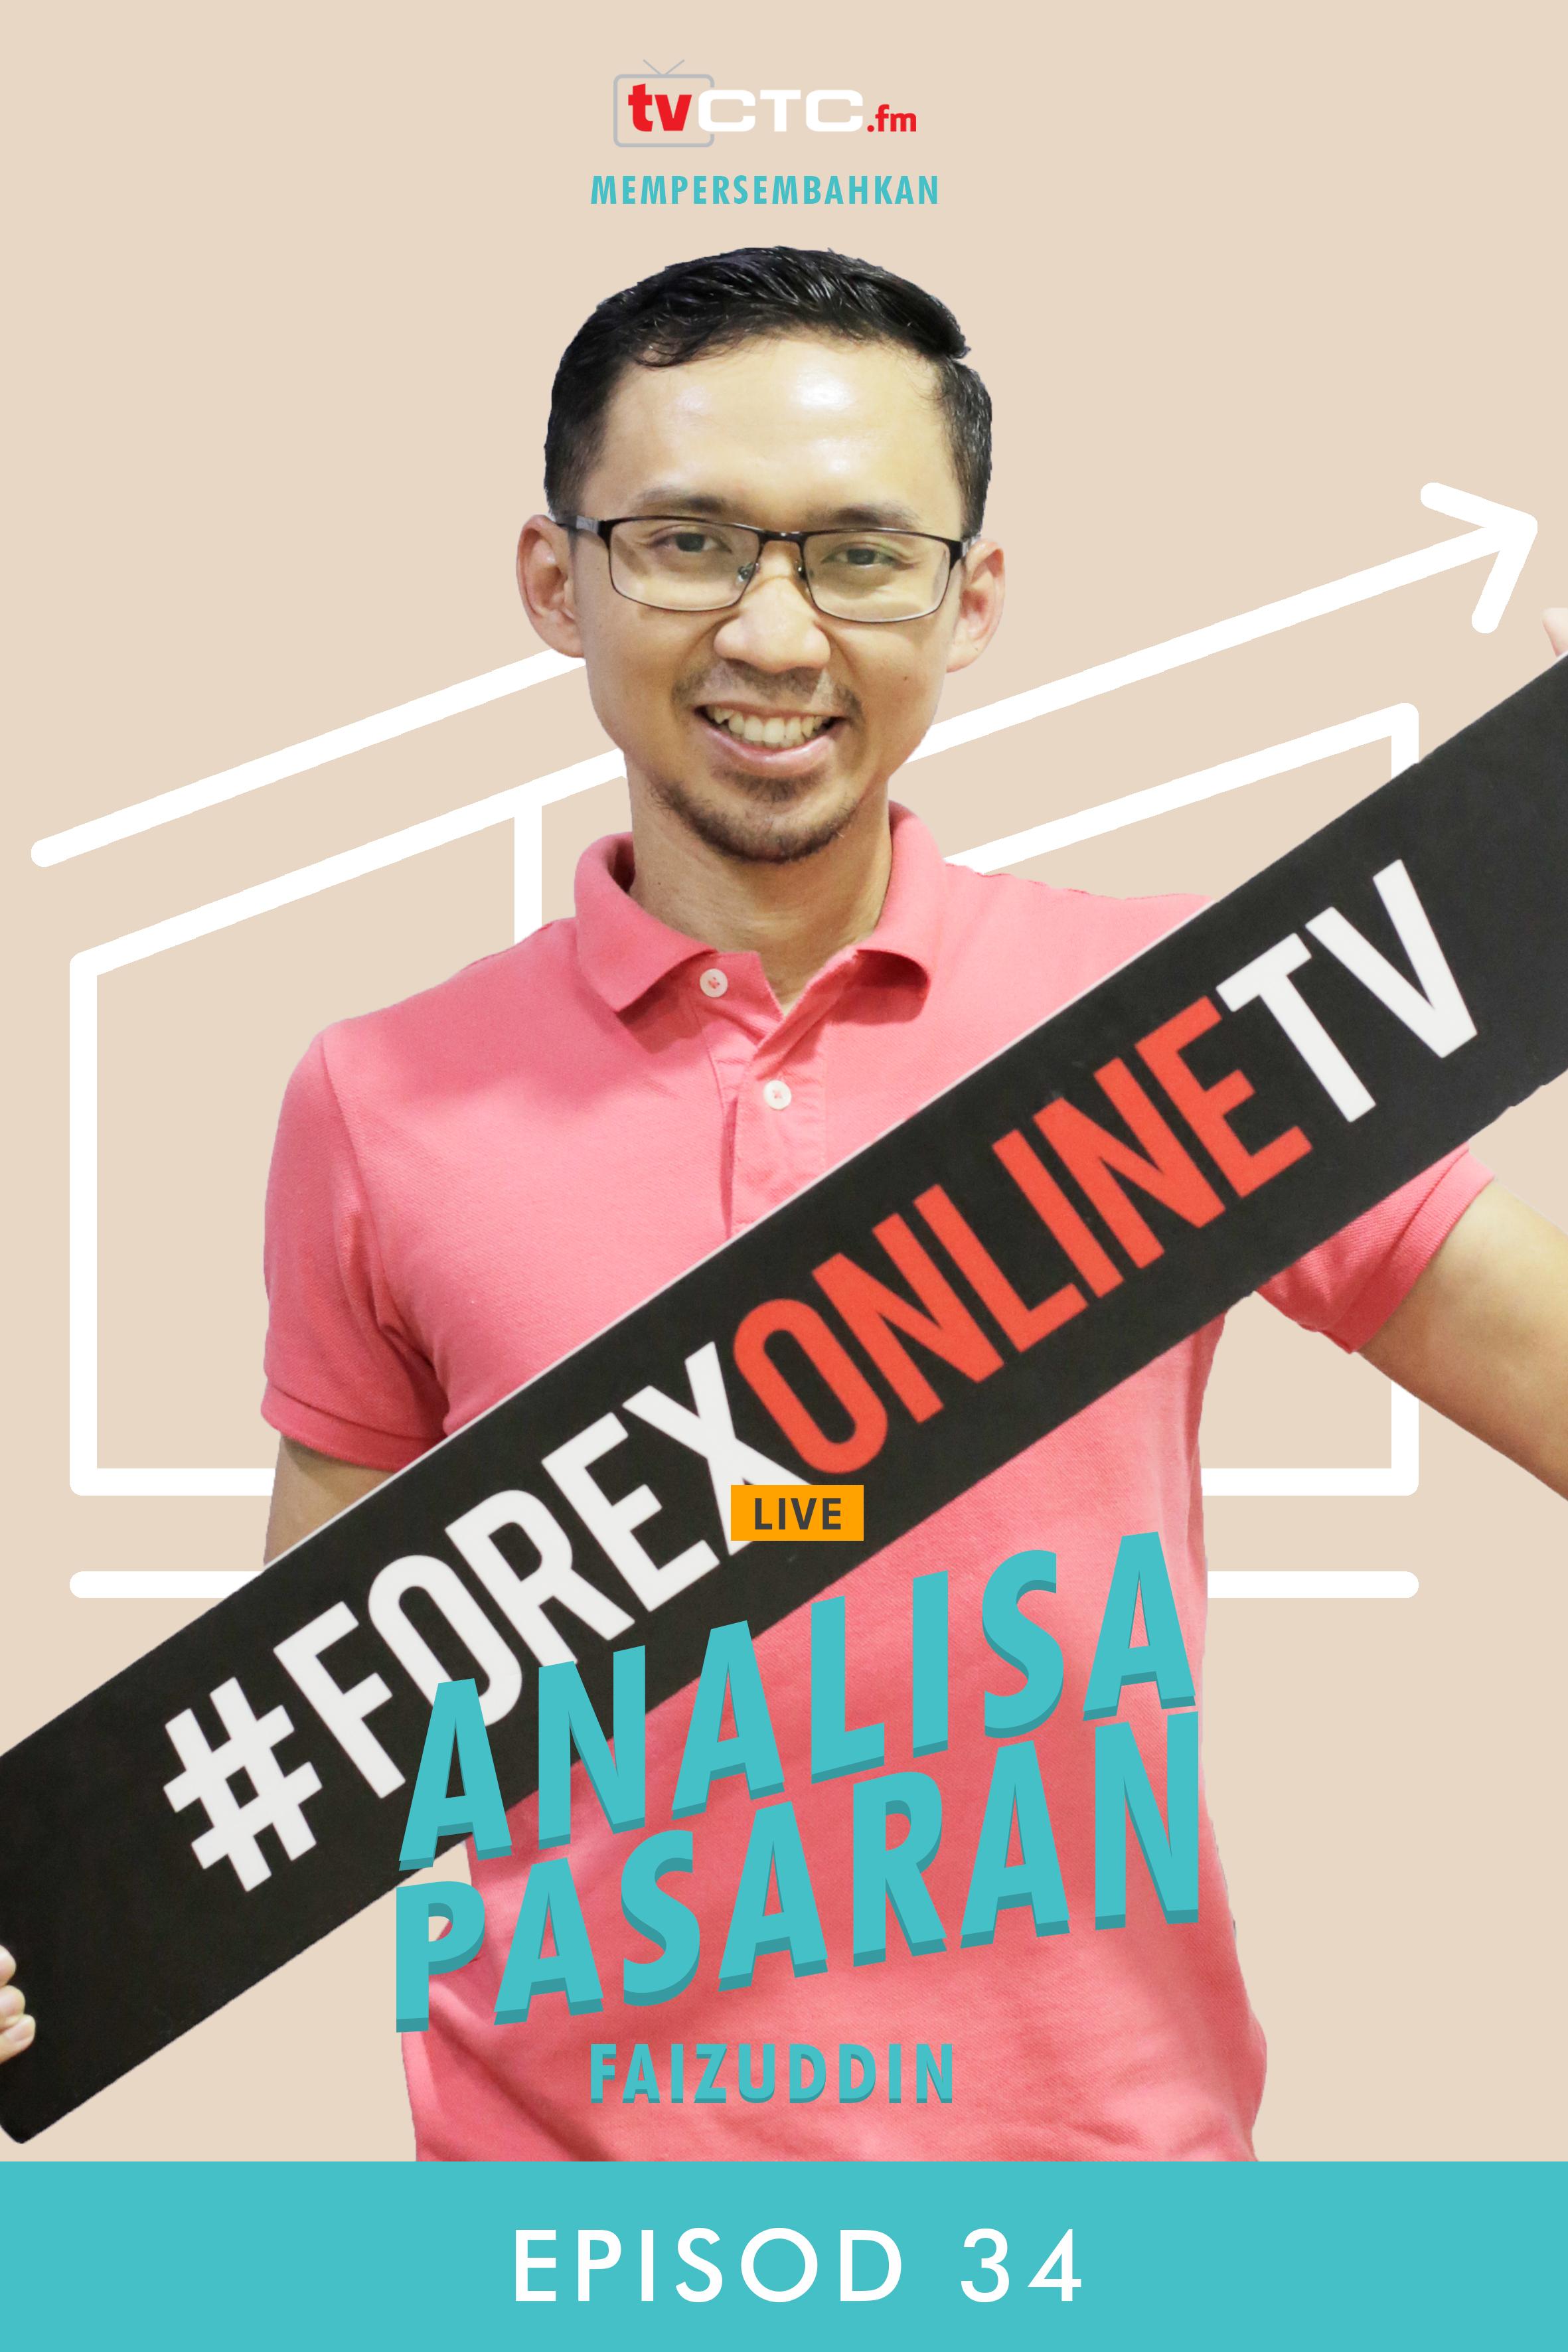 ANALISA PASARAN : Faizuddin (Episod 34)